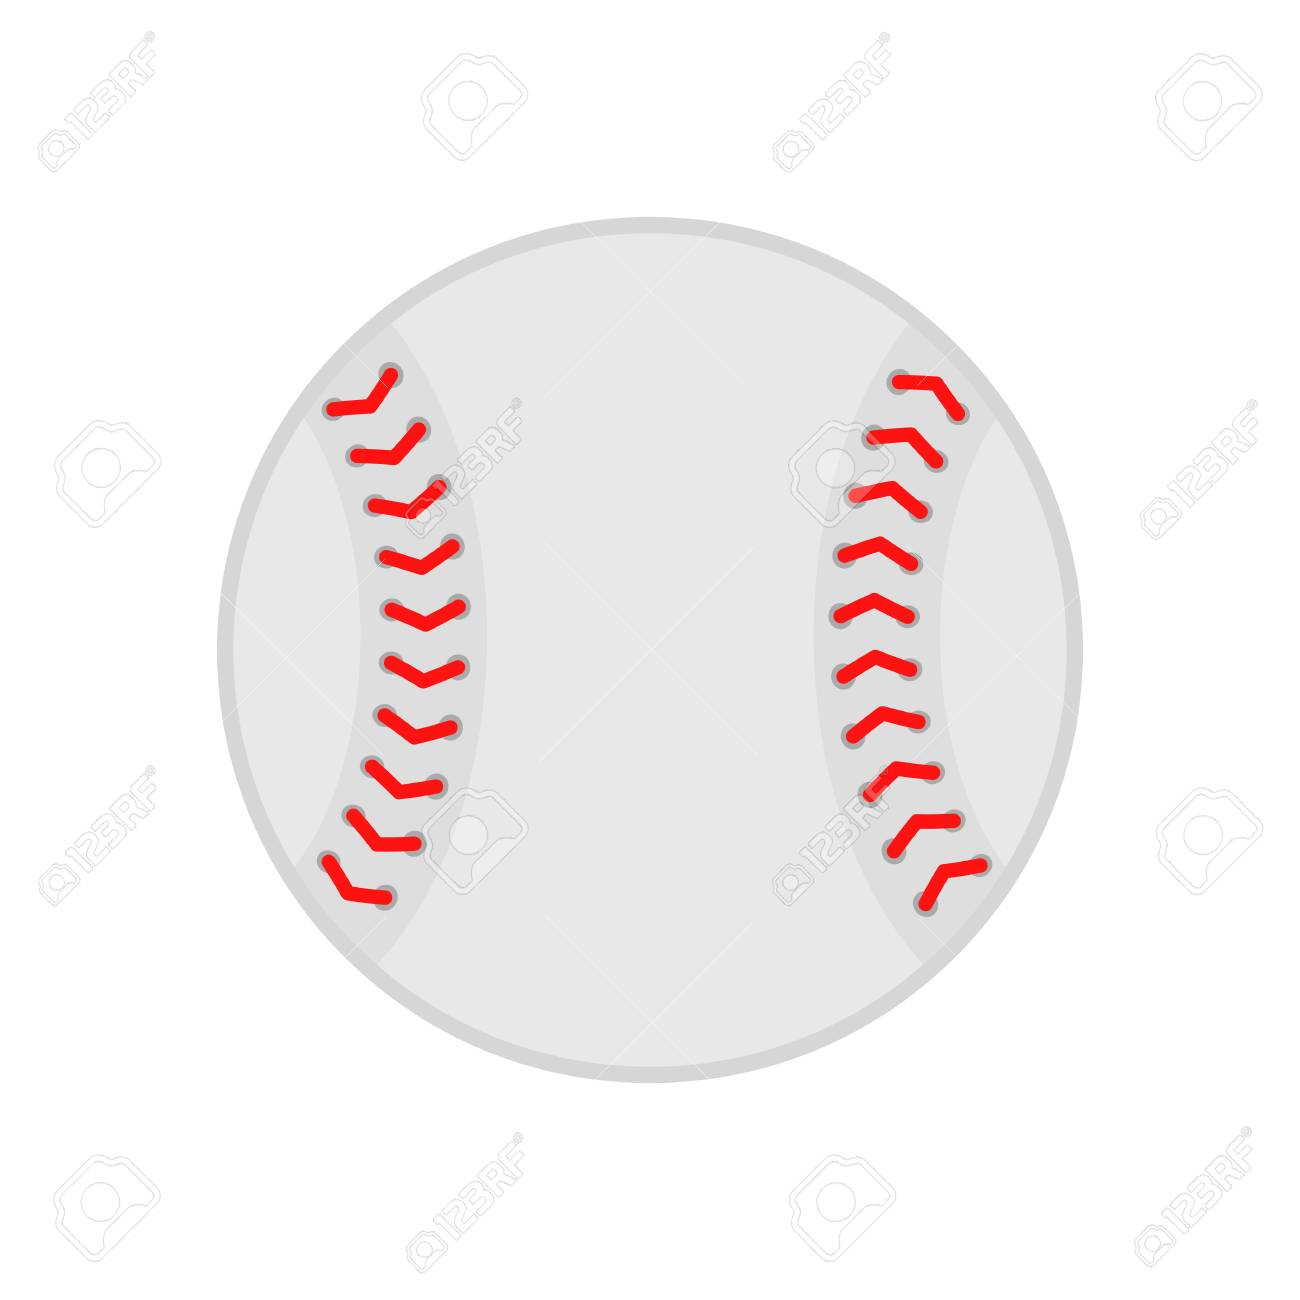 baseball icon clip art design illustration royalty free cliparts rh 123rf com baseball glove vector art baseball glove vector art